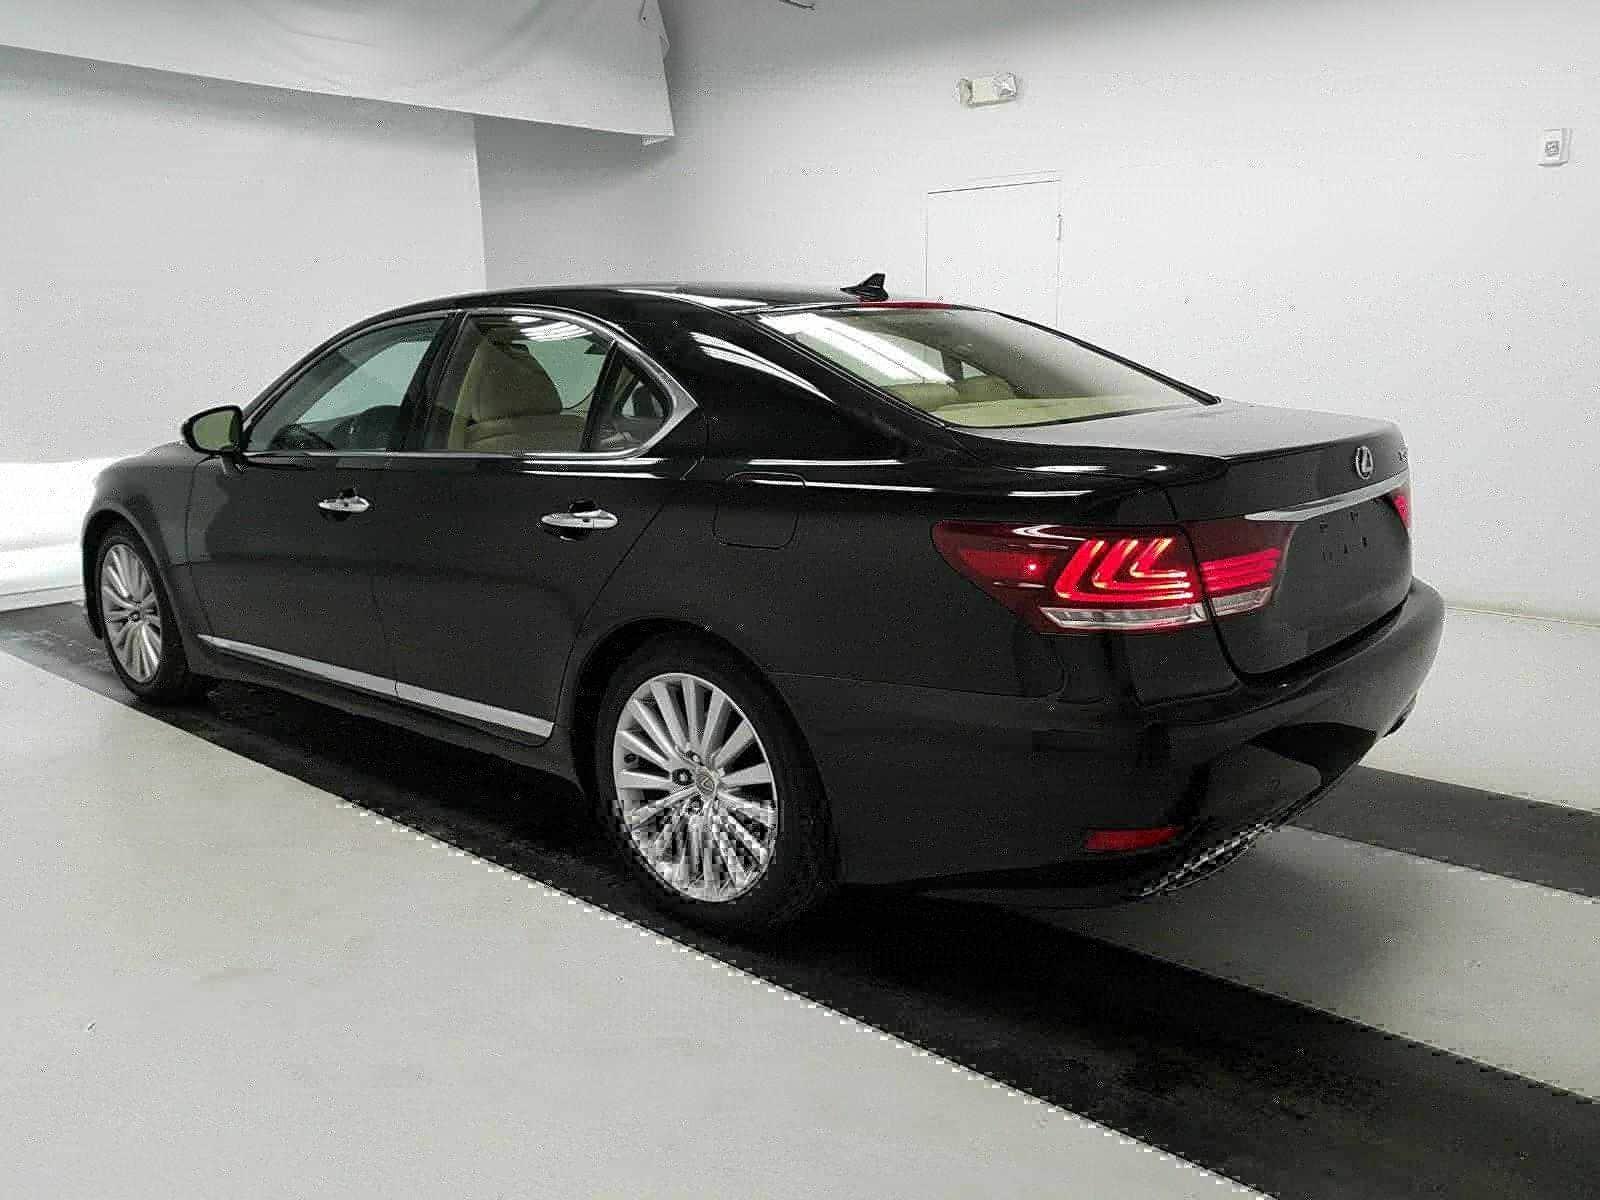 New Lexus 3/4 back view